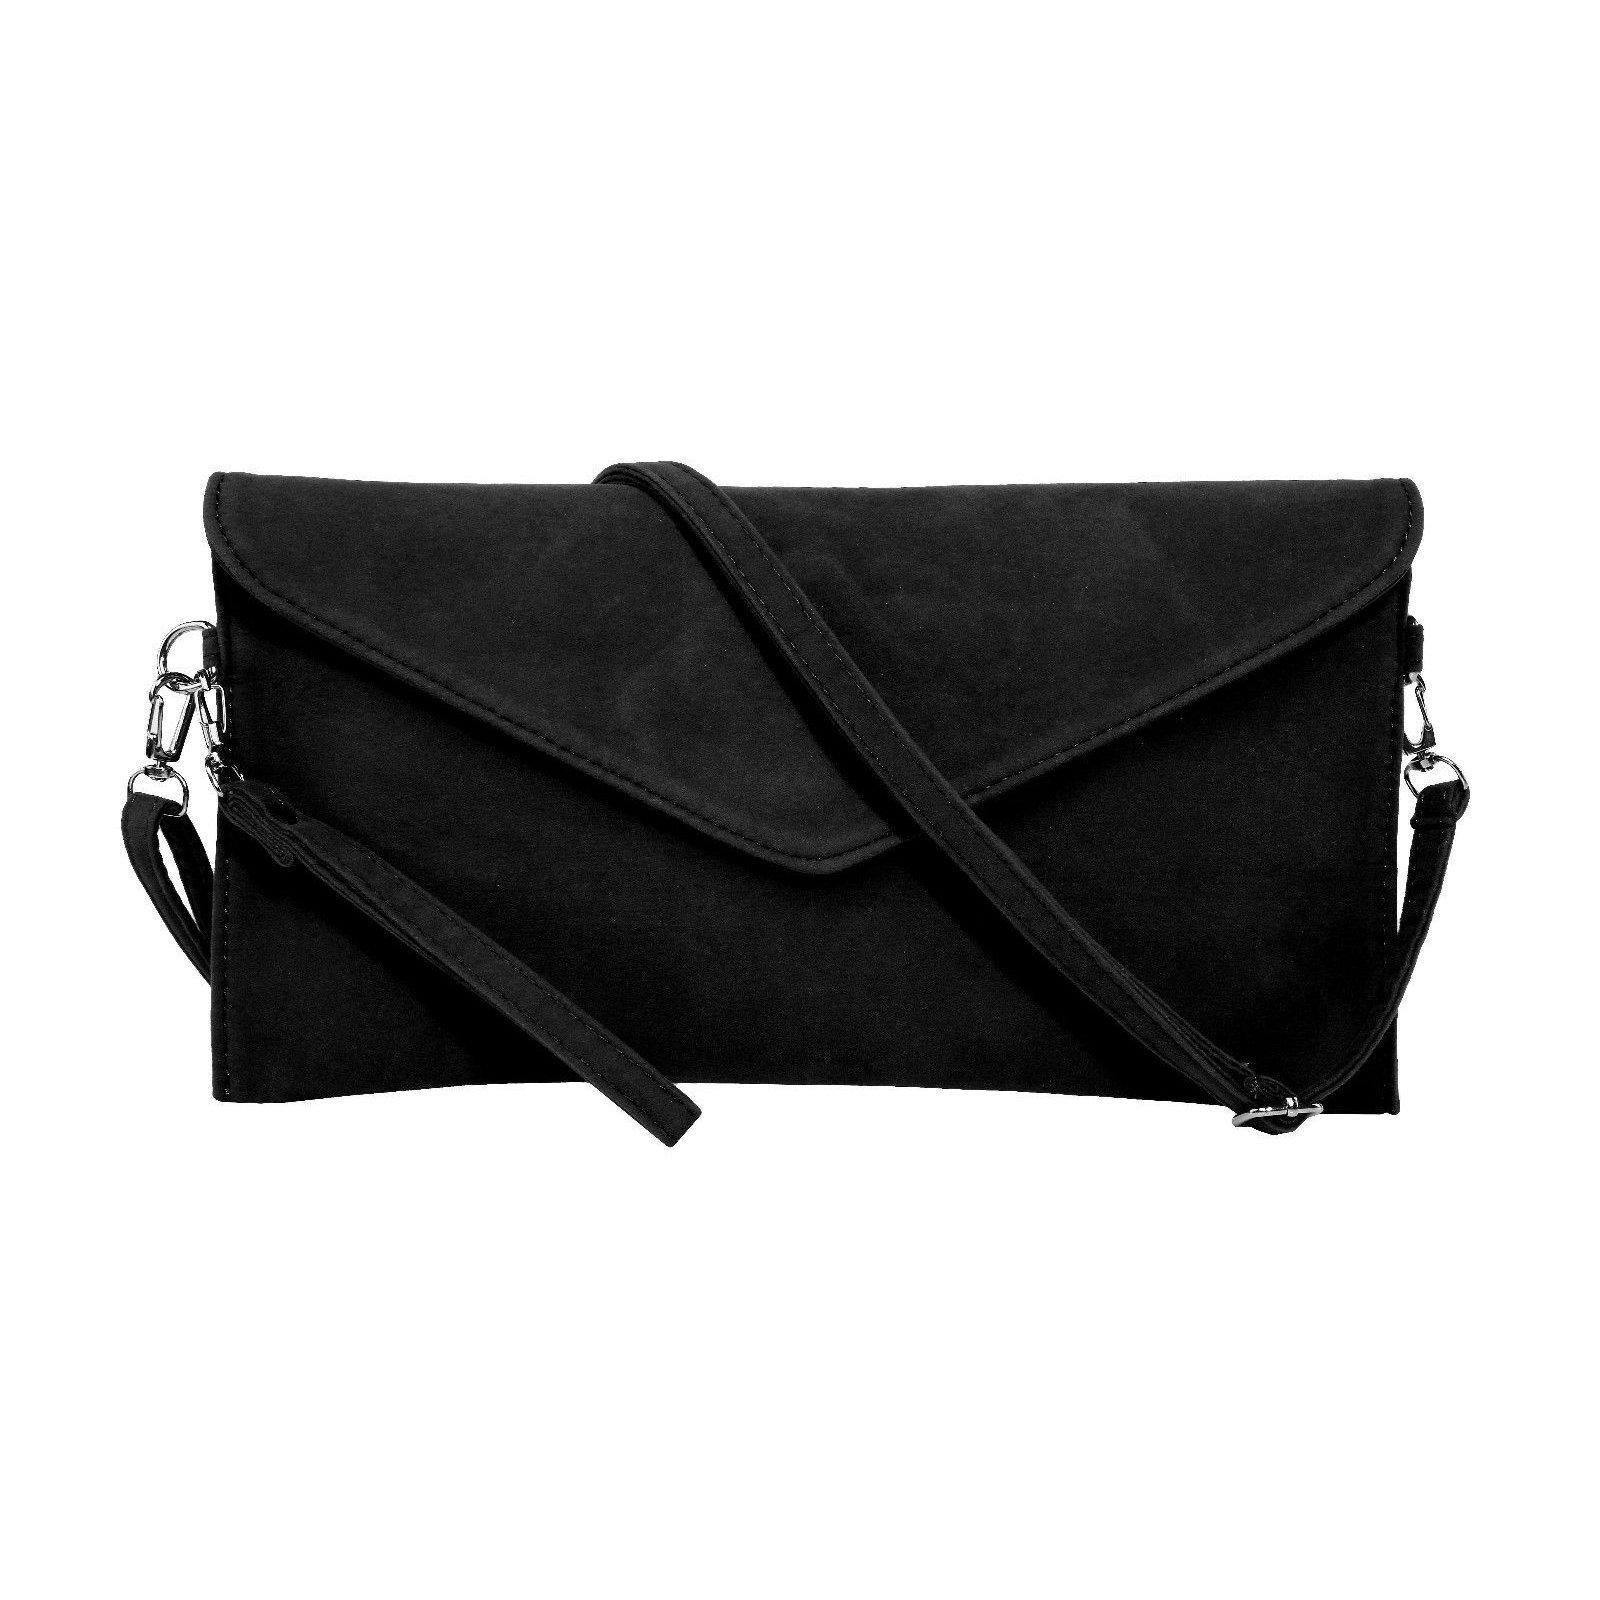 Jieway Women's Faux Suede Evening Clutch Bag Crossbody Bag Shoulder Handbags (Black)